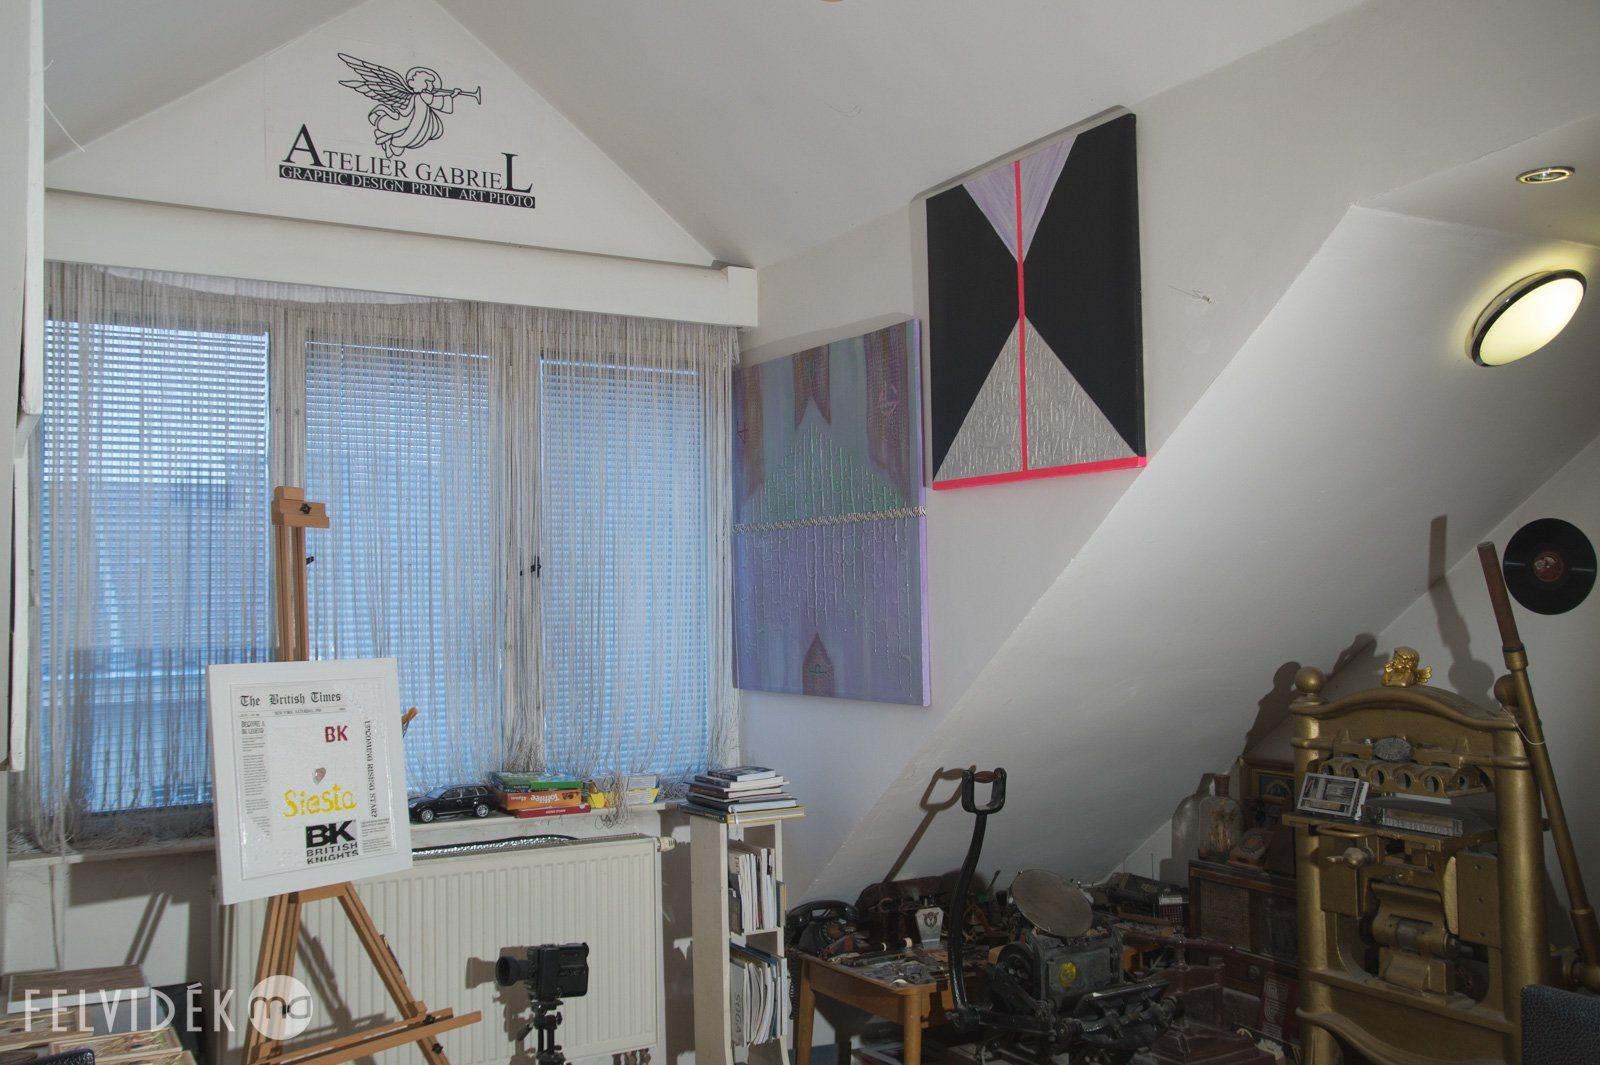 m terem l togat son kalita g born l felvid. Black Bedroom Furniture Sets. Home Design Ideas